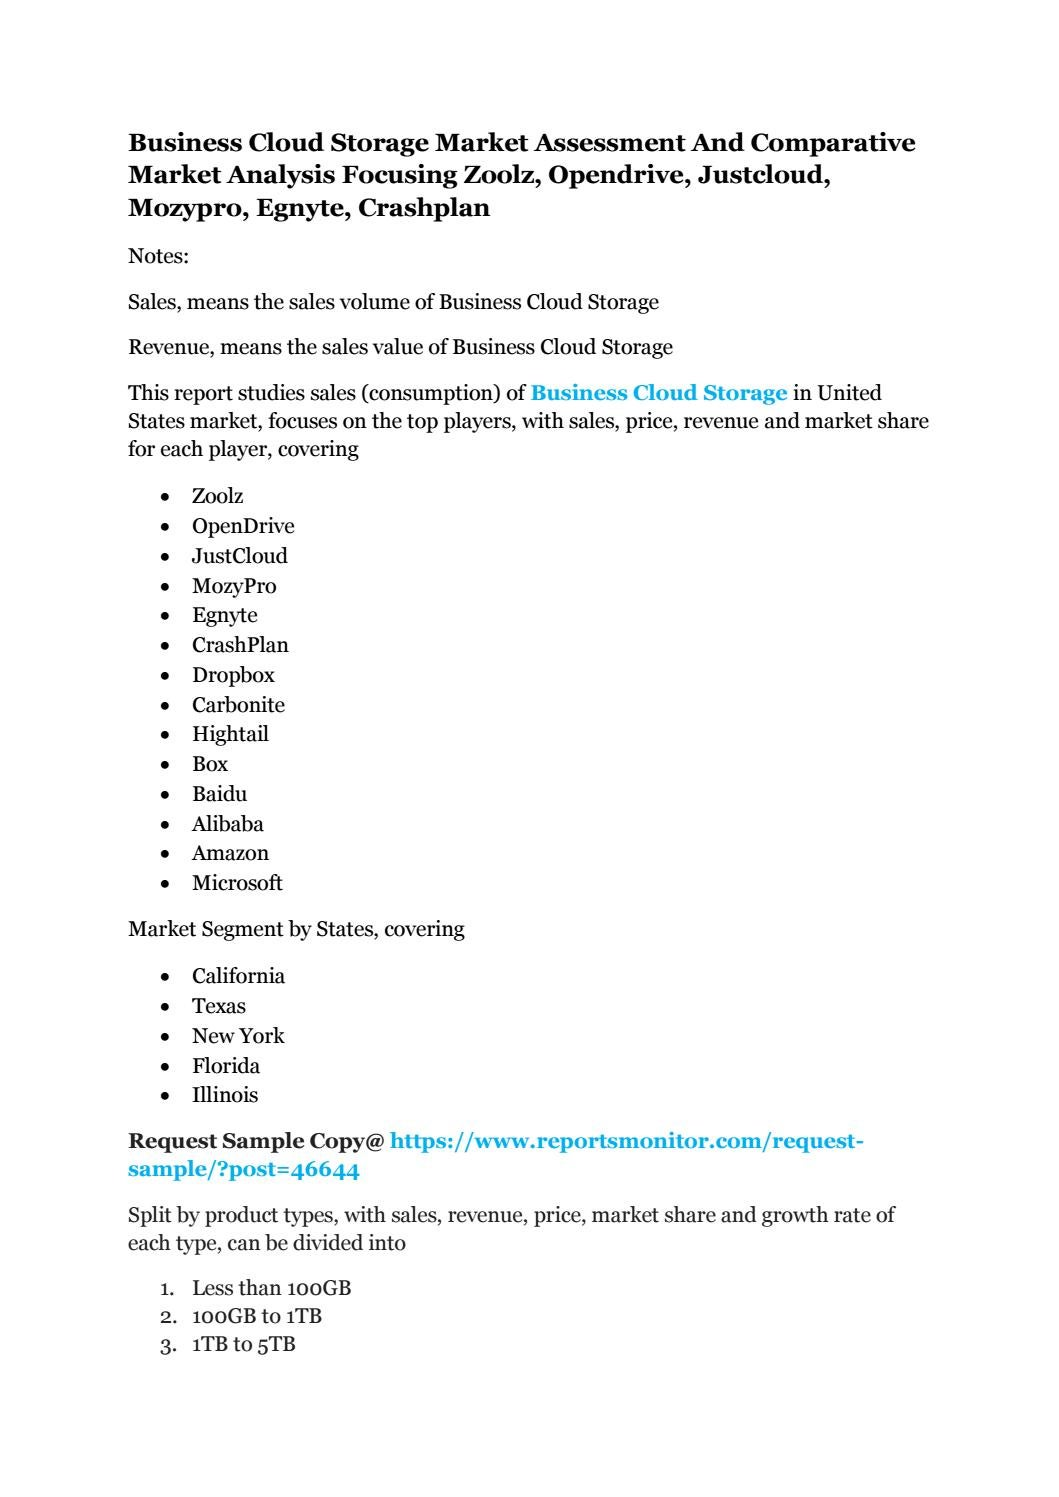 Business cloud storage market assessment and comparative market